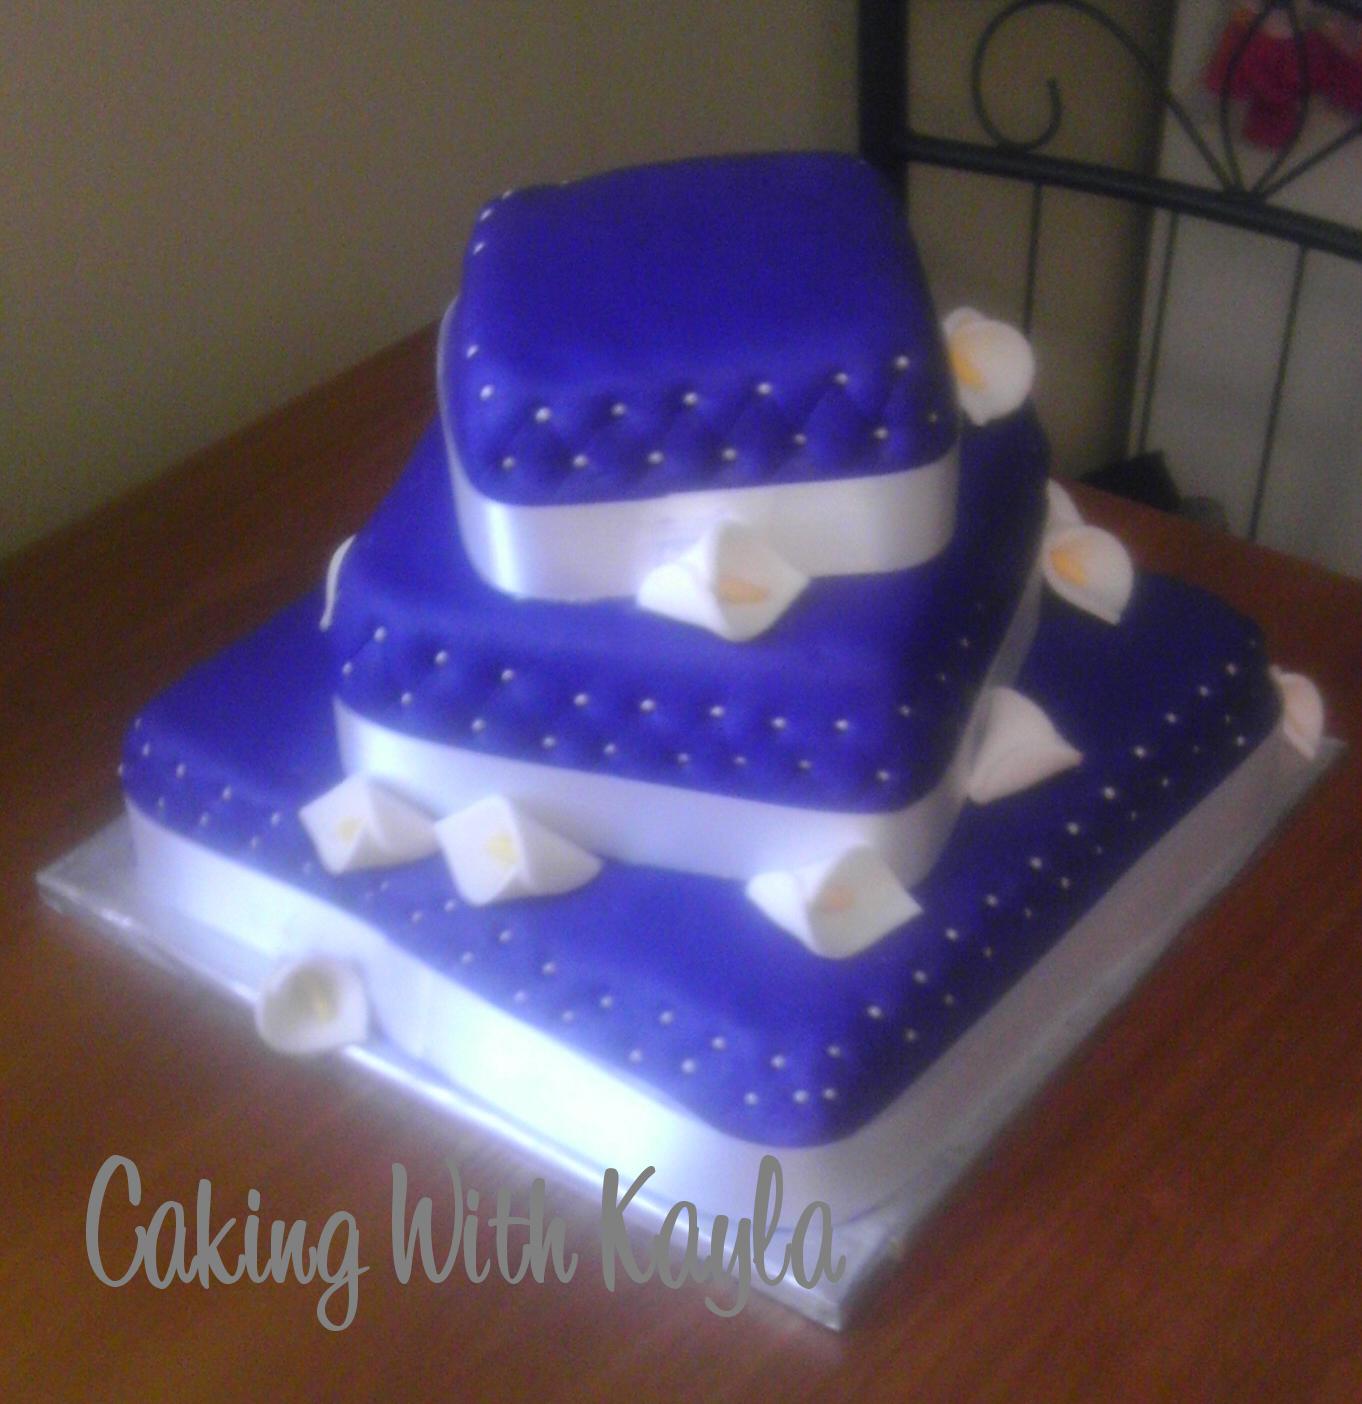 Caking with Kayla July 2012